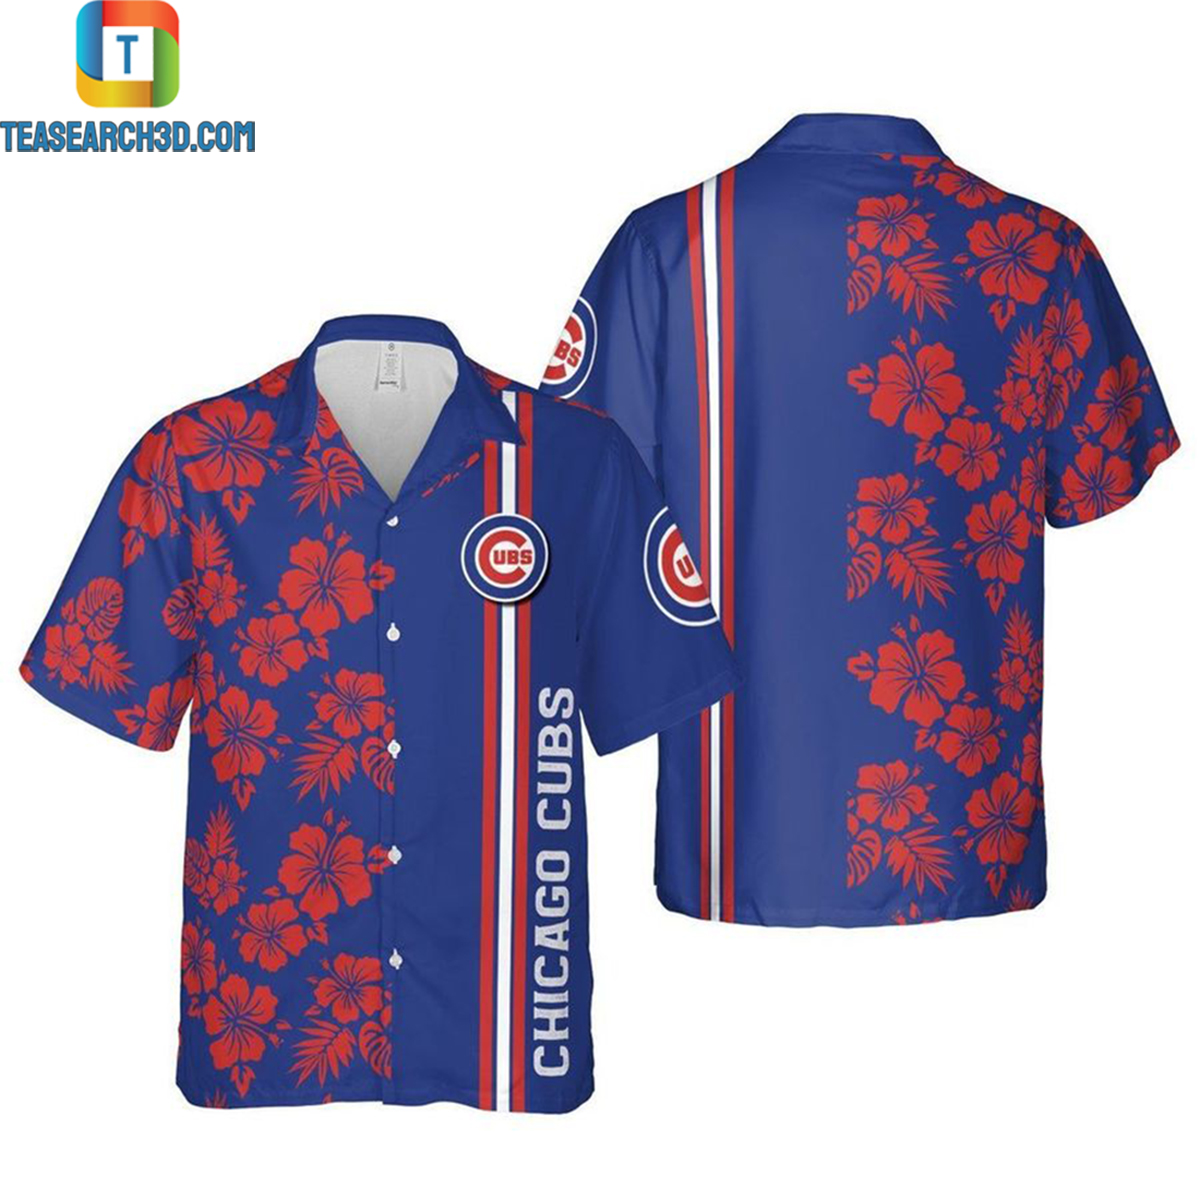 Chicago cubs mlb chicago illinois nfl football hawaiian shirt 2